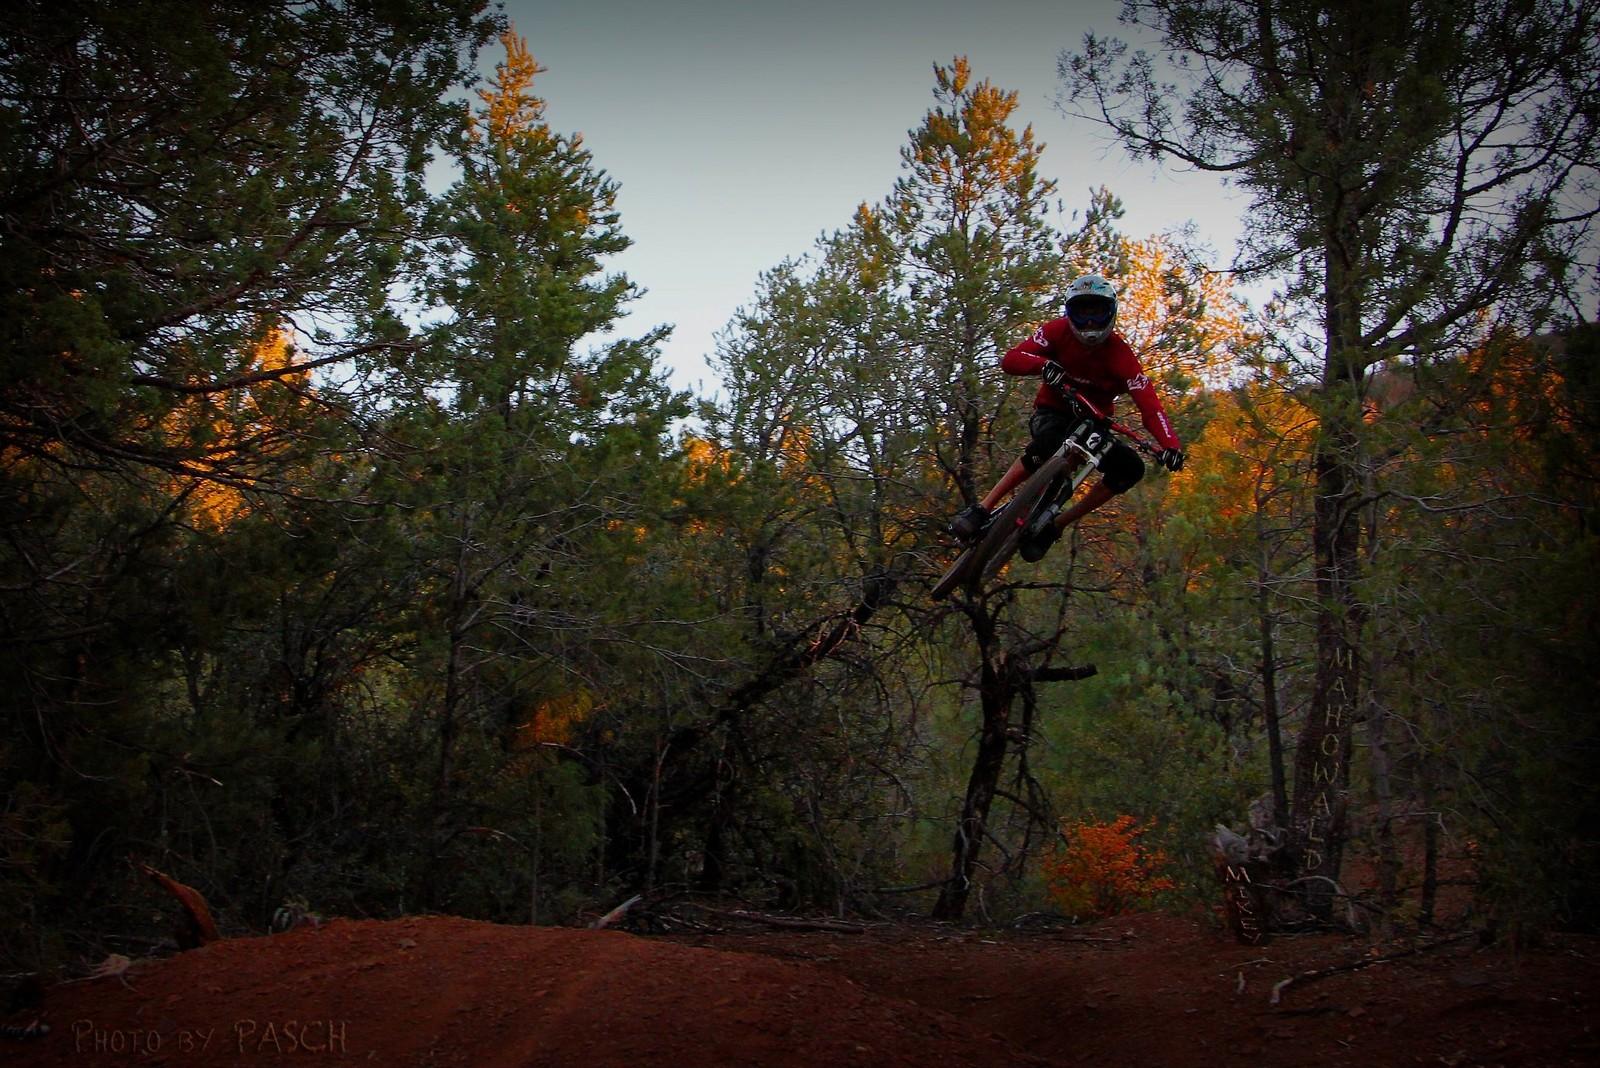 Mingus jump - Mike-e - Mountain Biking Pictures - Vital MTB